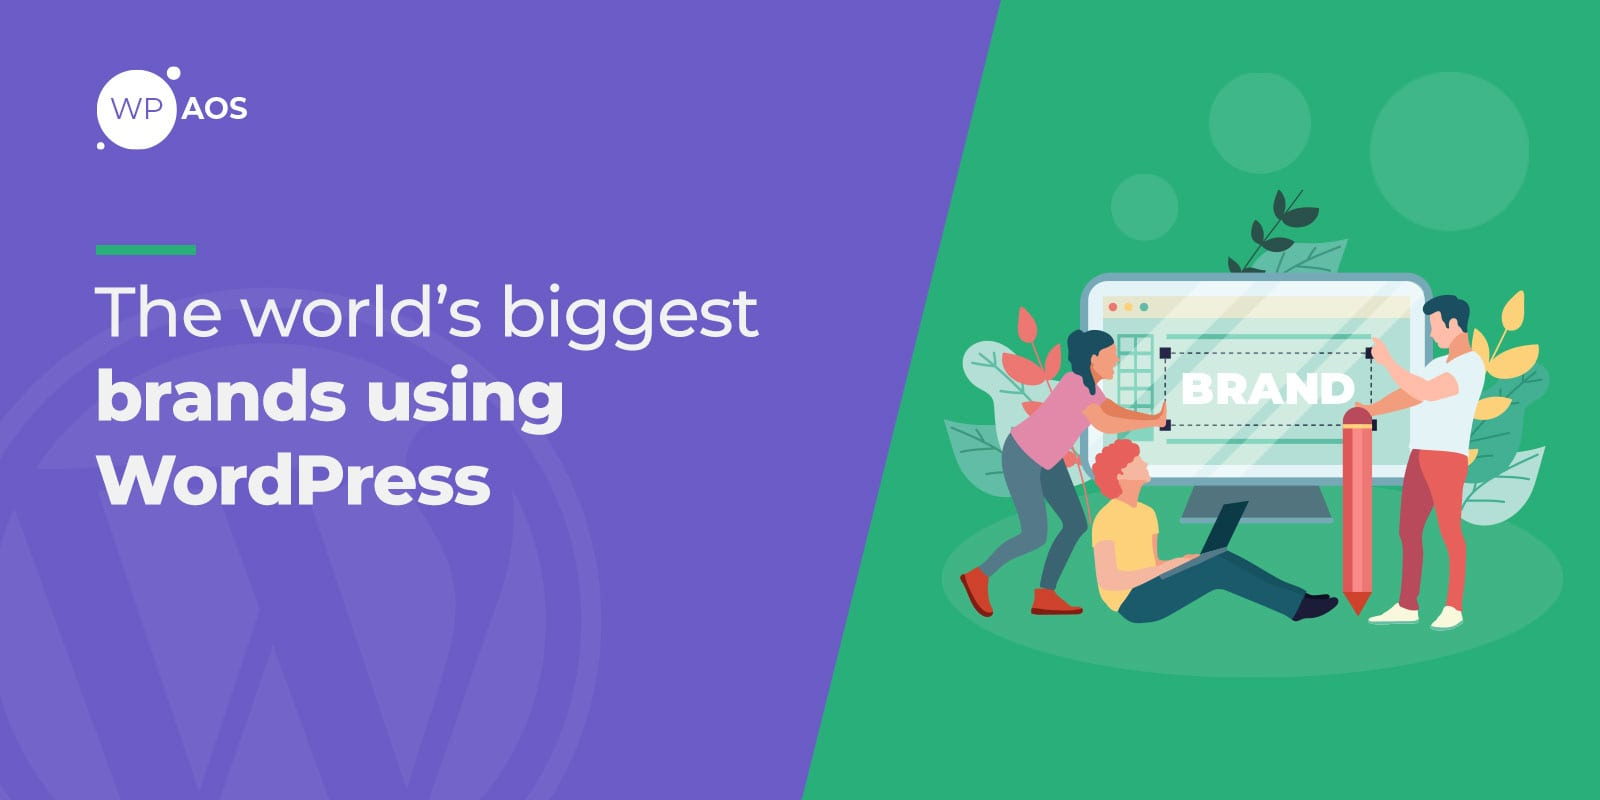 Biggest brands using WordPress